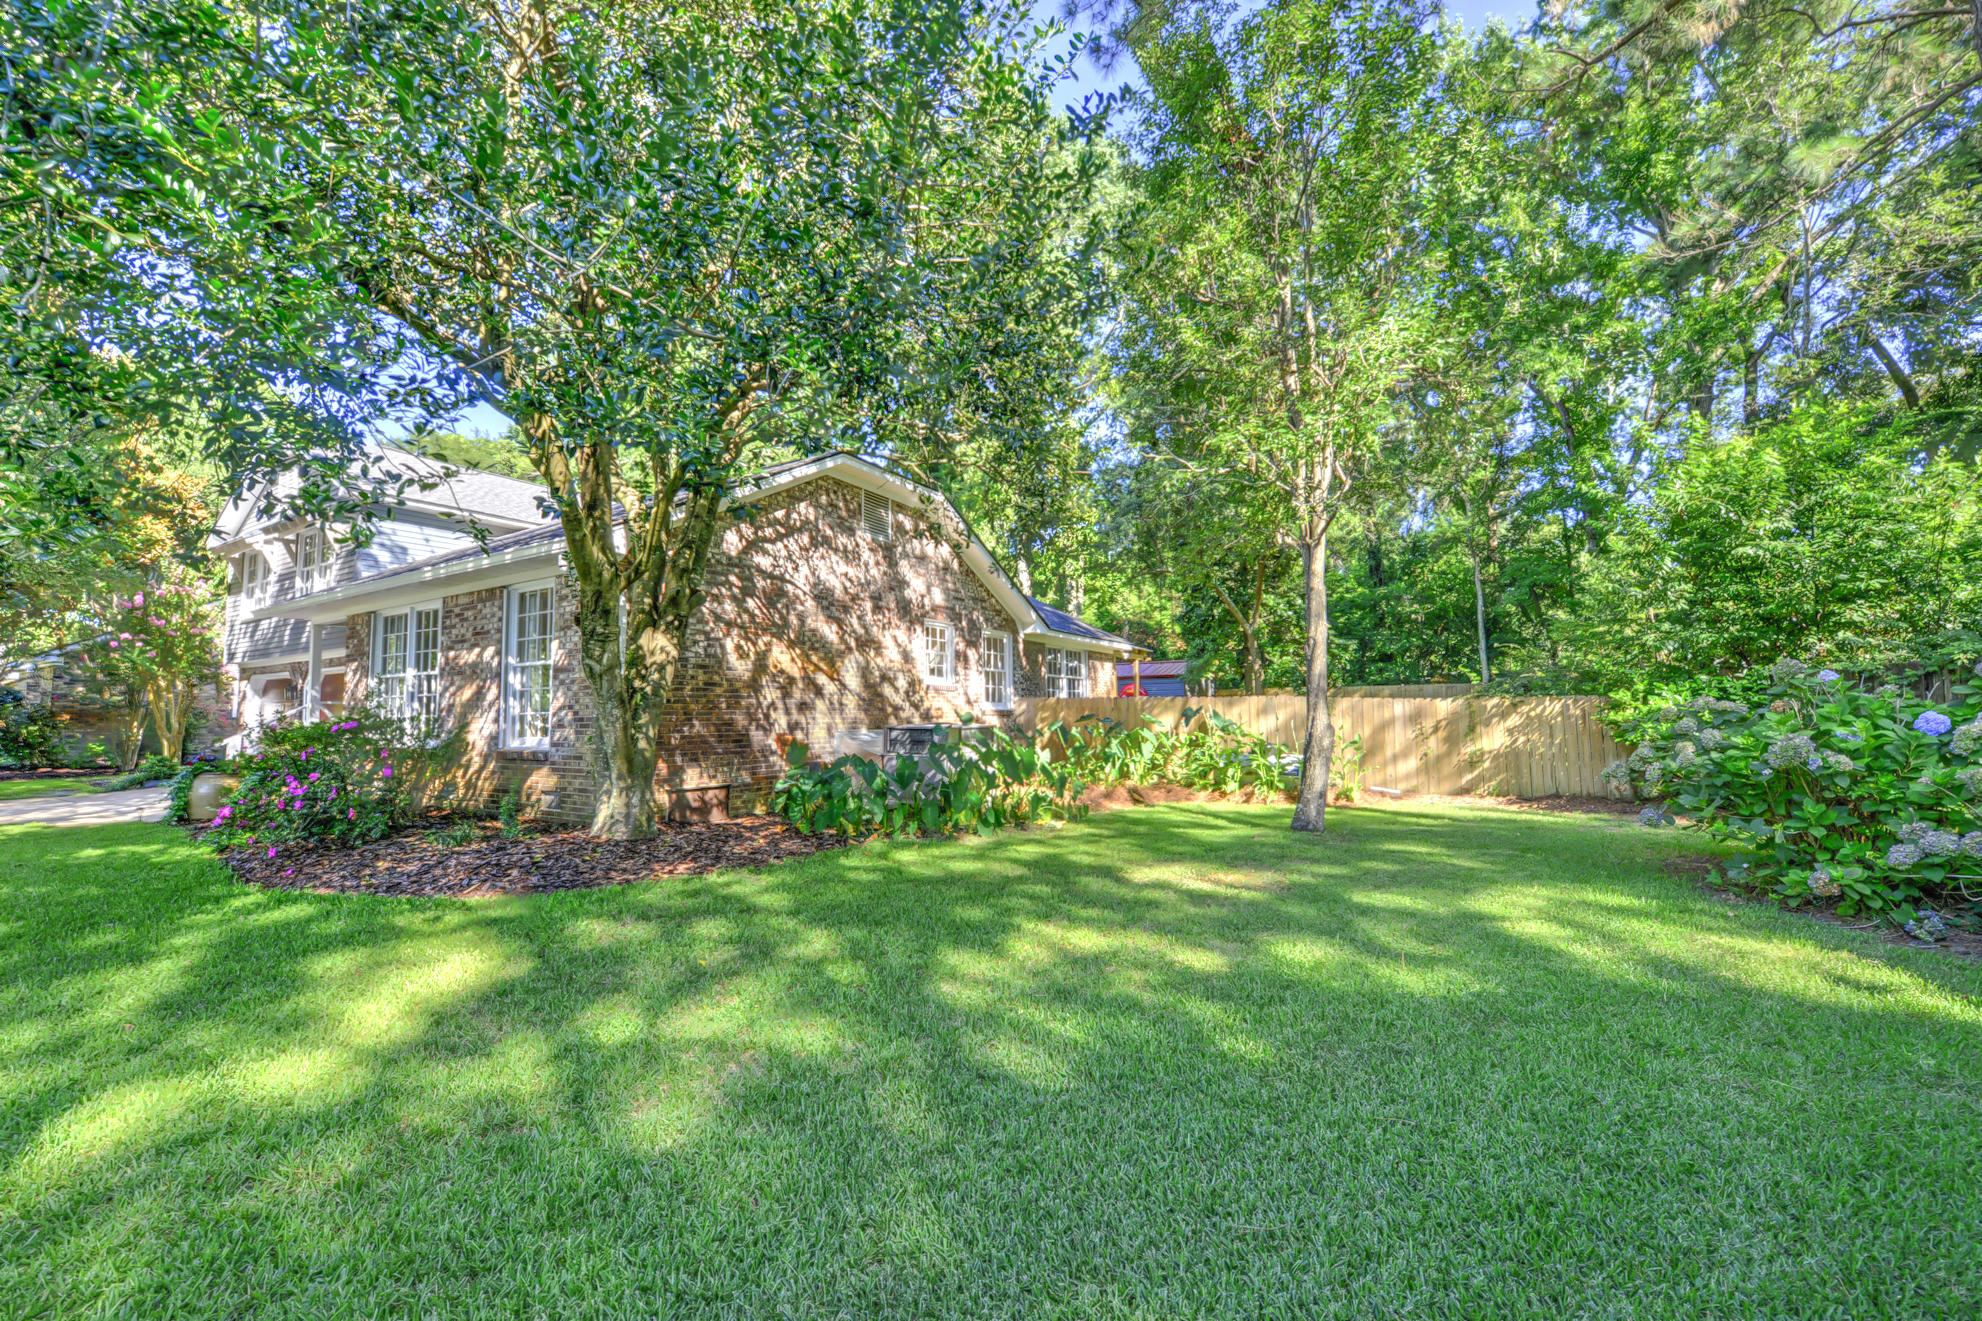 Shemwood II Homes For Sale - 1017 Jack Snipe, Mount Pleasant, SC - 21